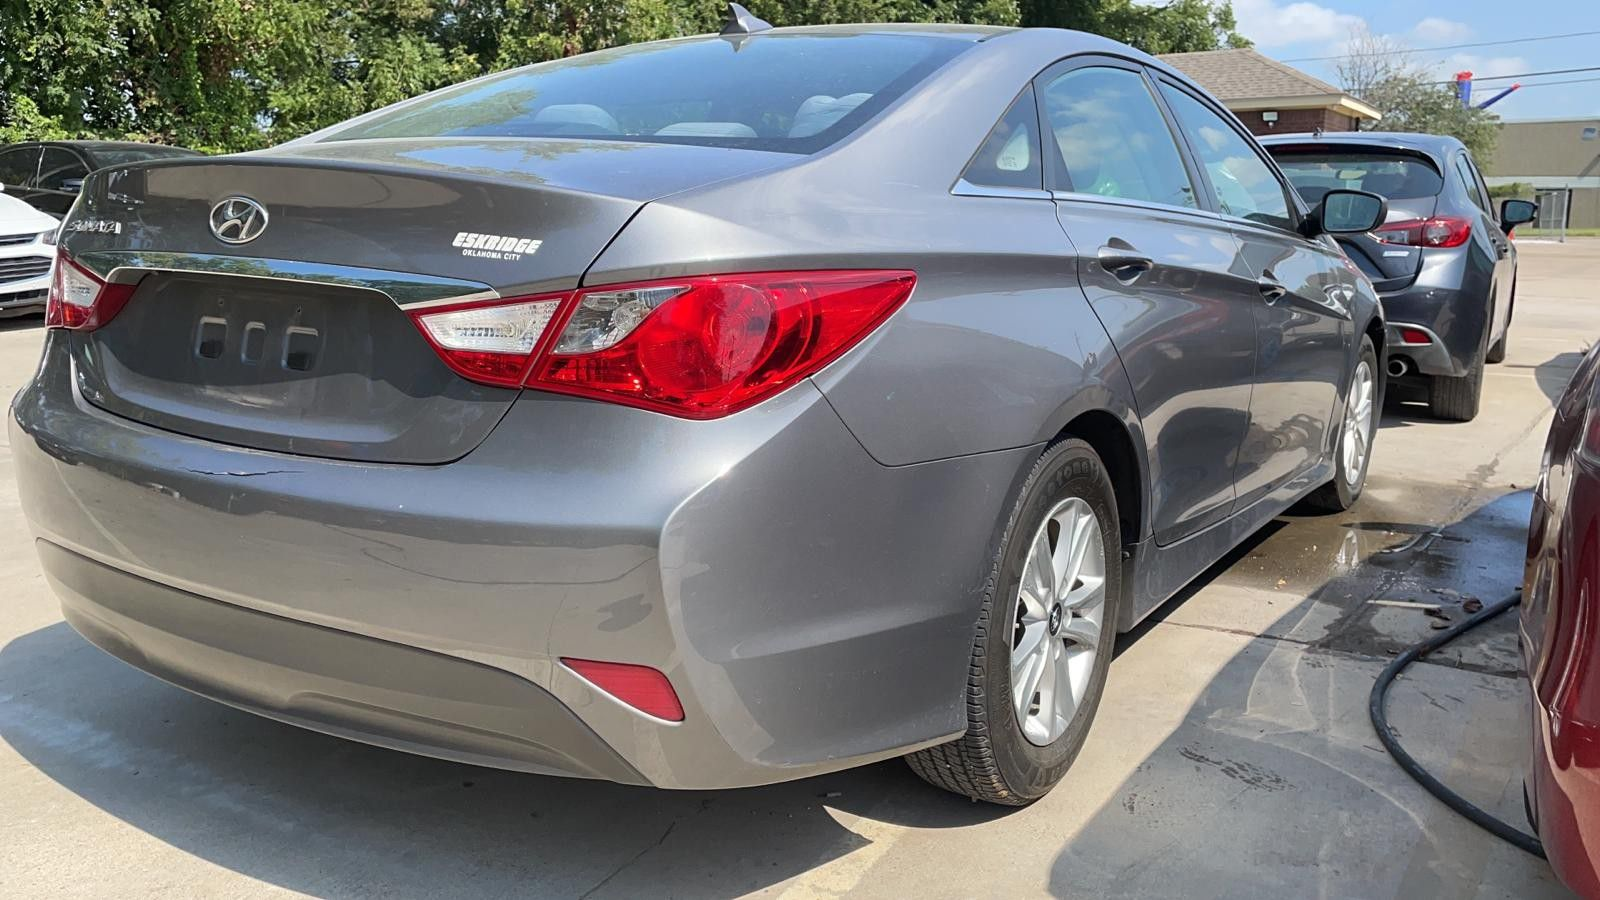 Runs n drives perfect - 2014 Hyundai Sonata GLS